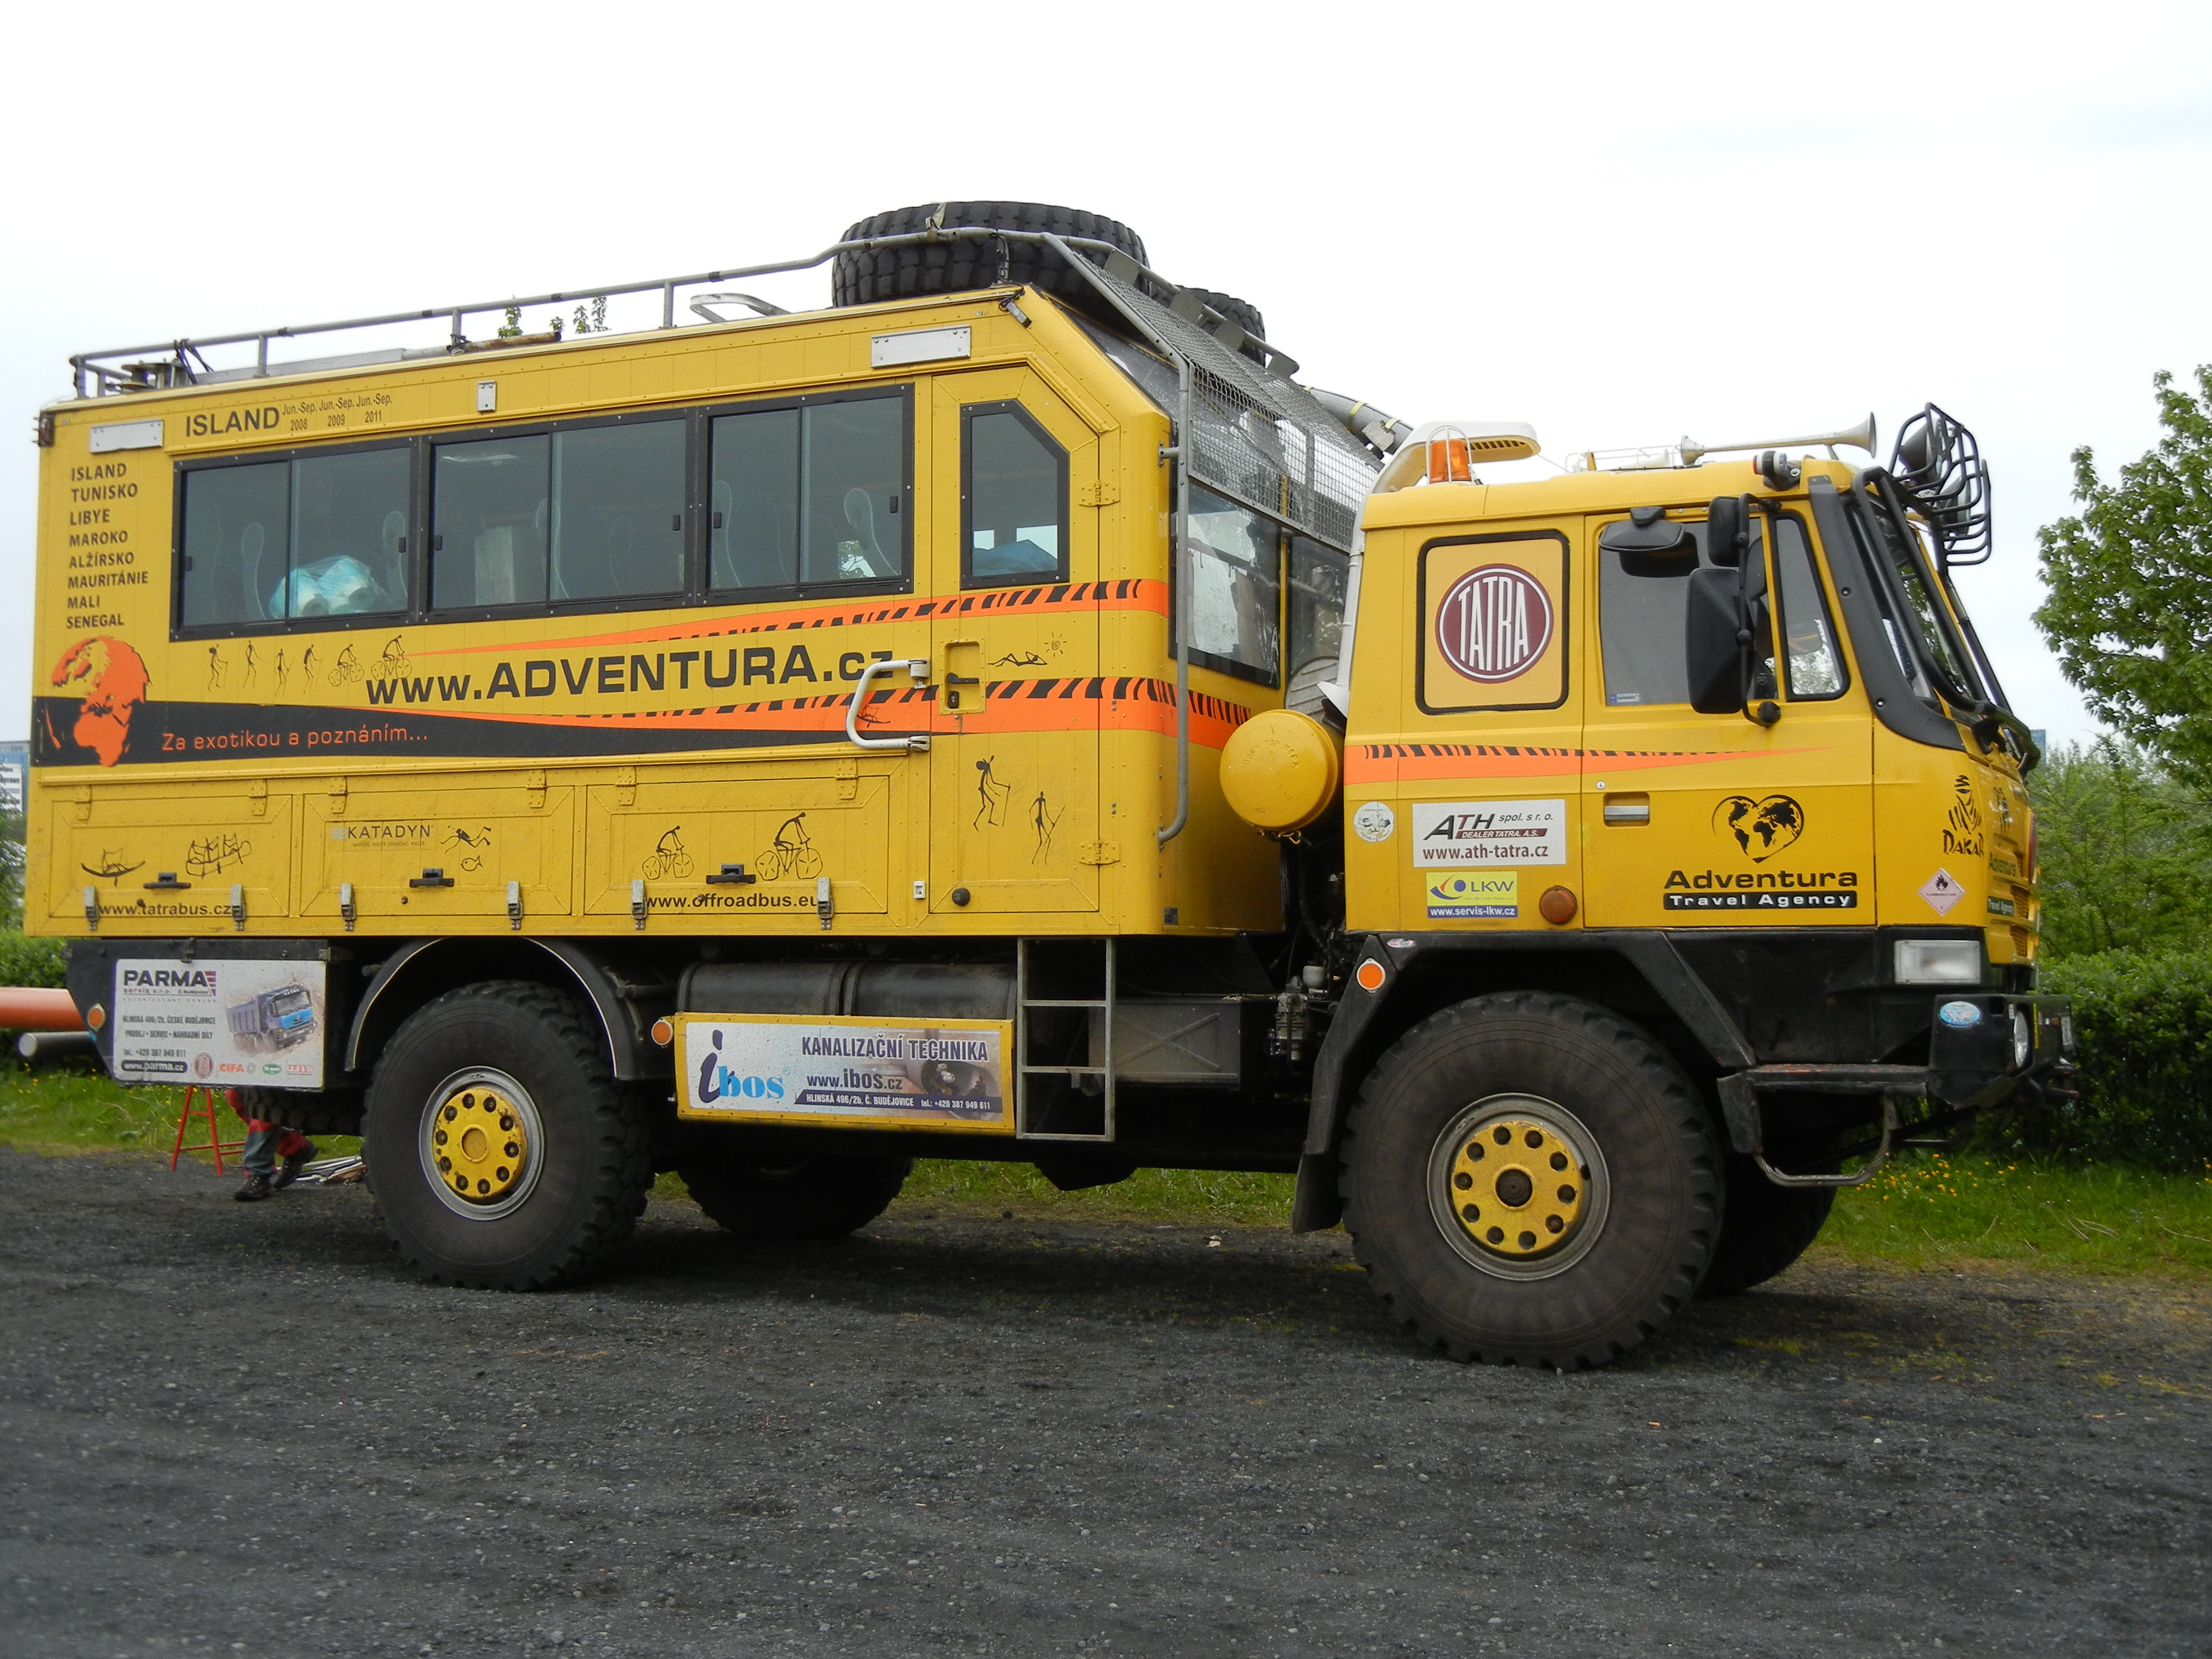 Adventure Trucks in Iceland